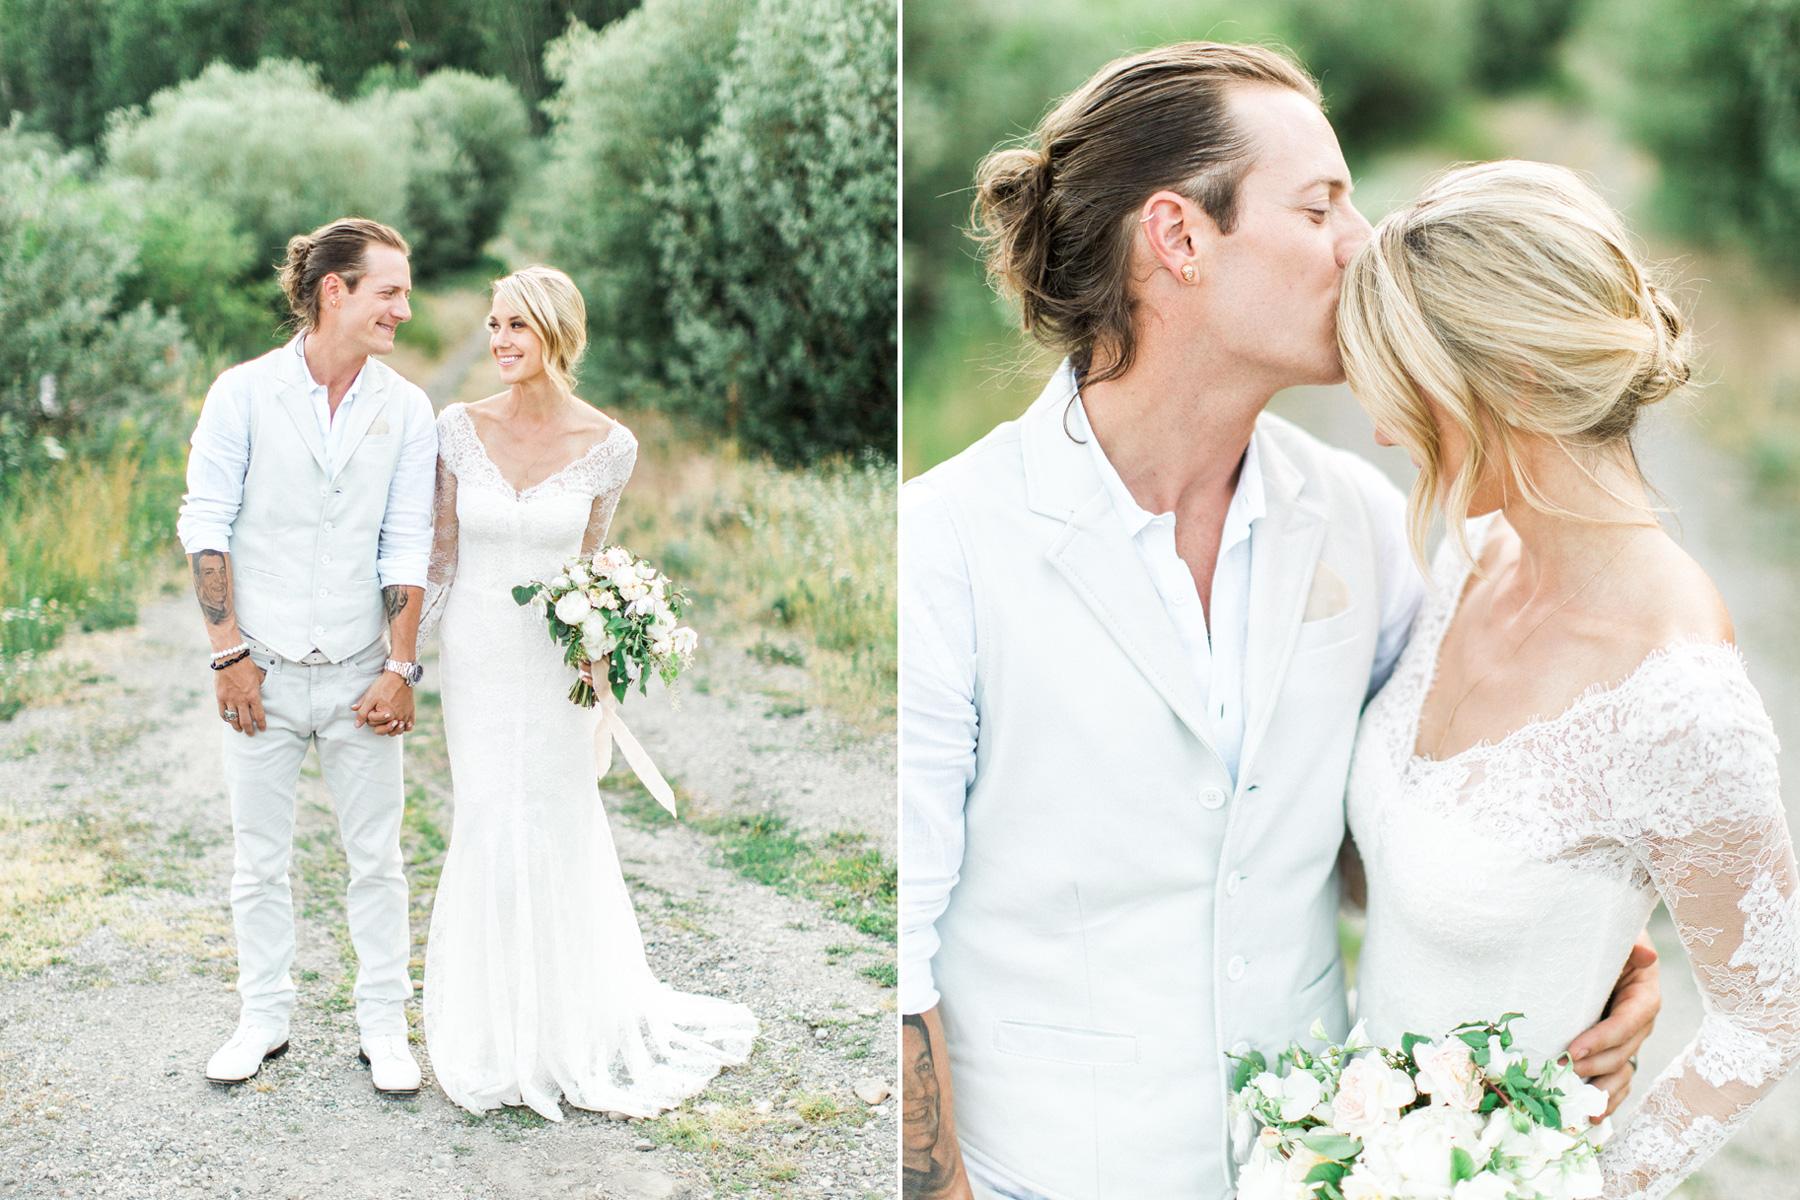 tyler-hubbard-wedding-01.jpg